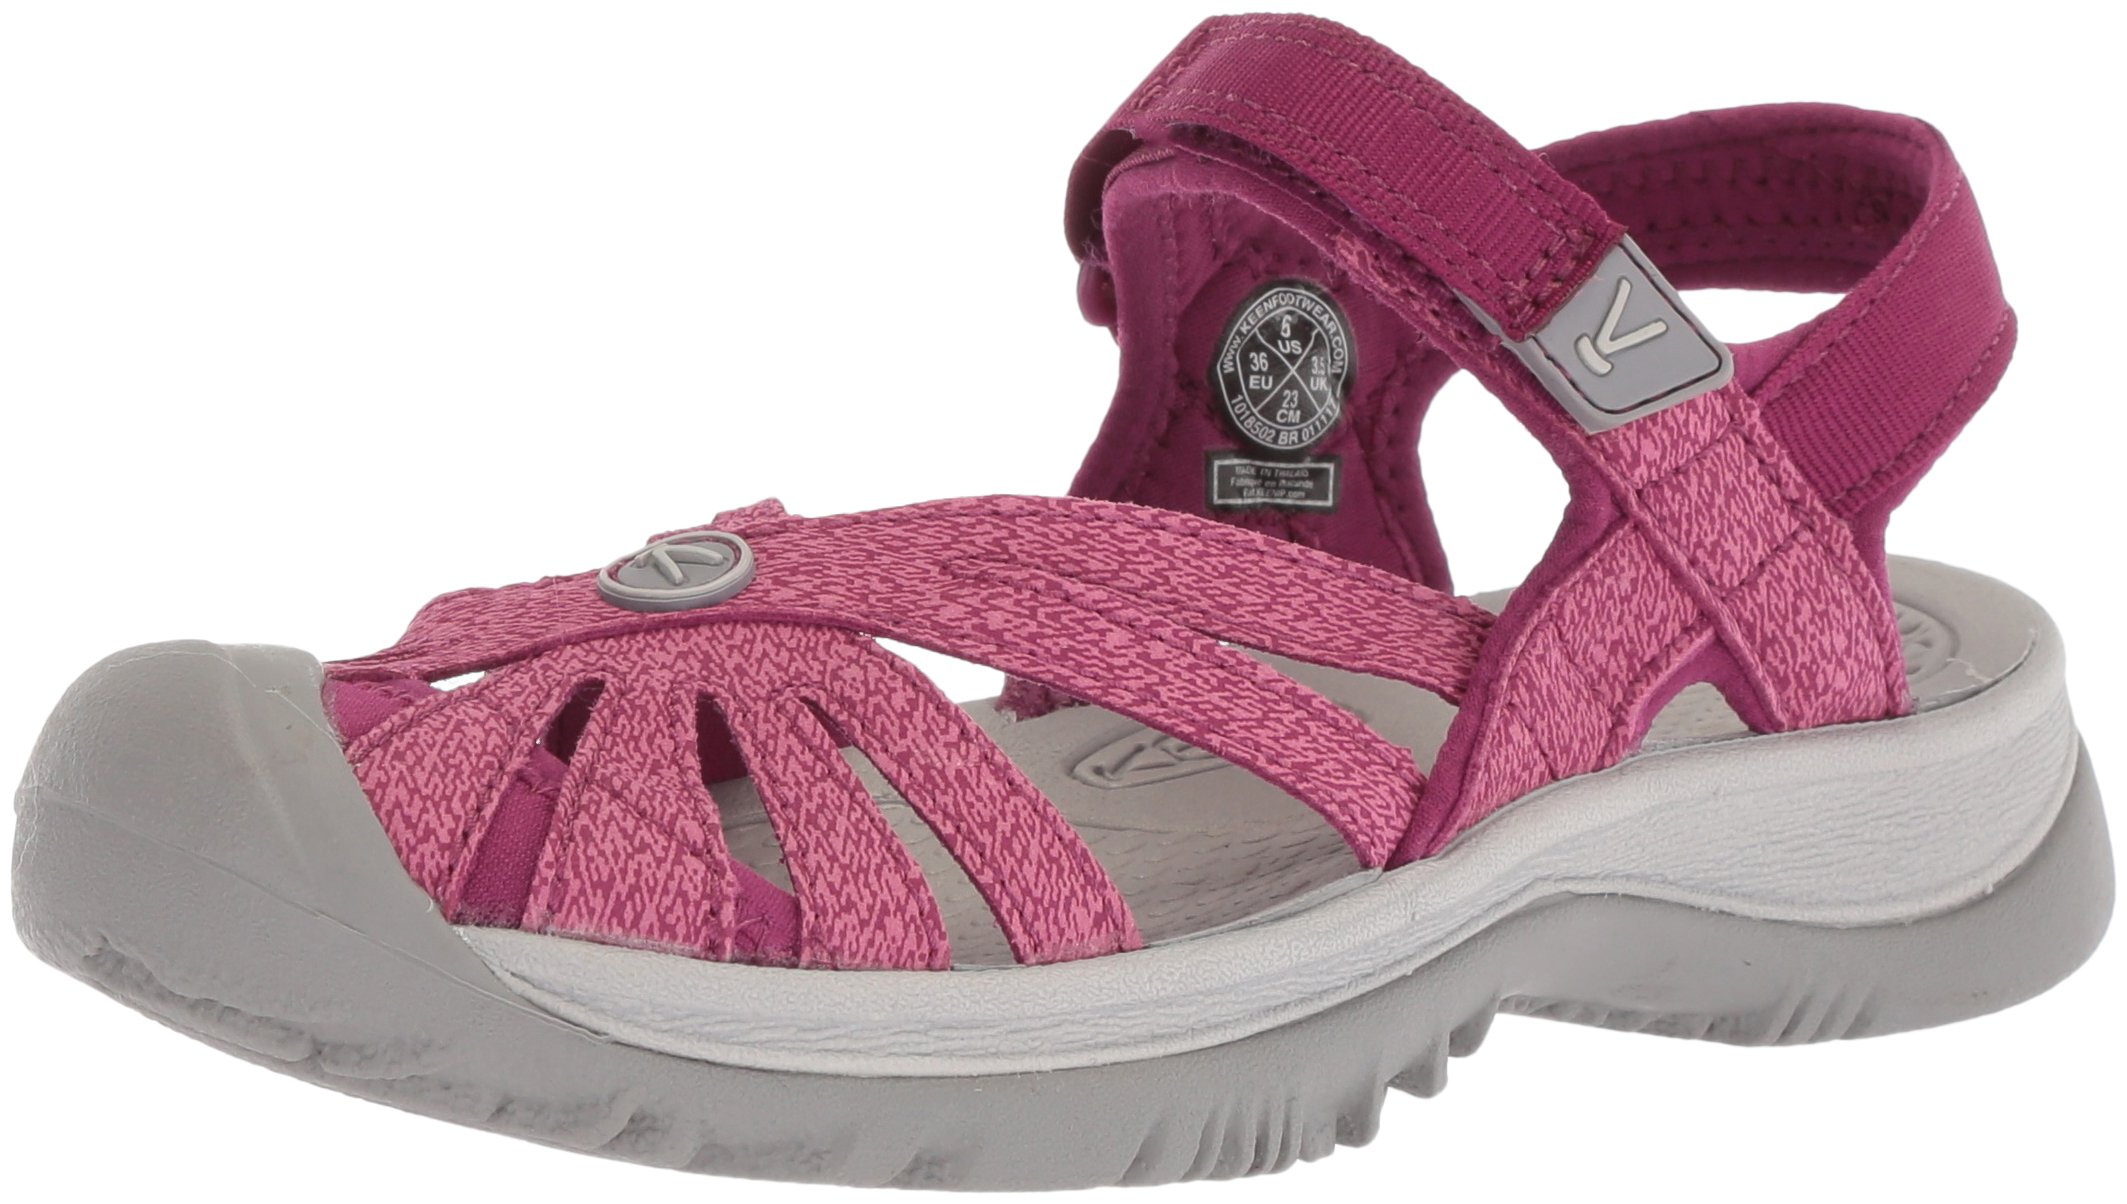 Keen Women's Rose Sandal-W, Boysenberry/red Violet 7.5 M US